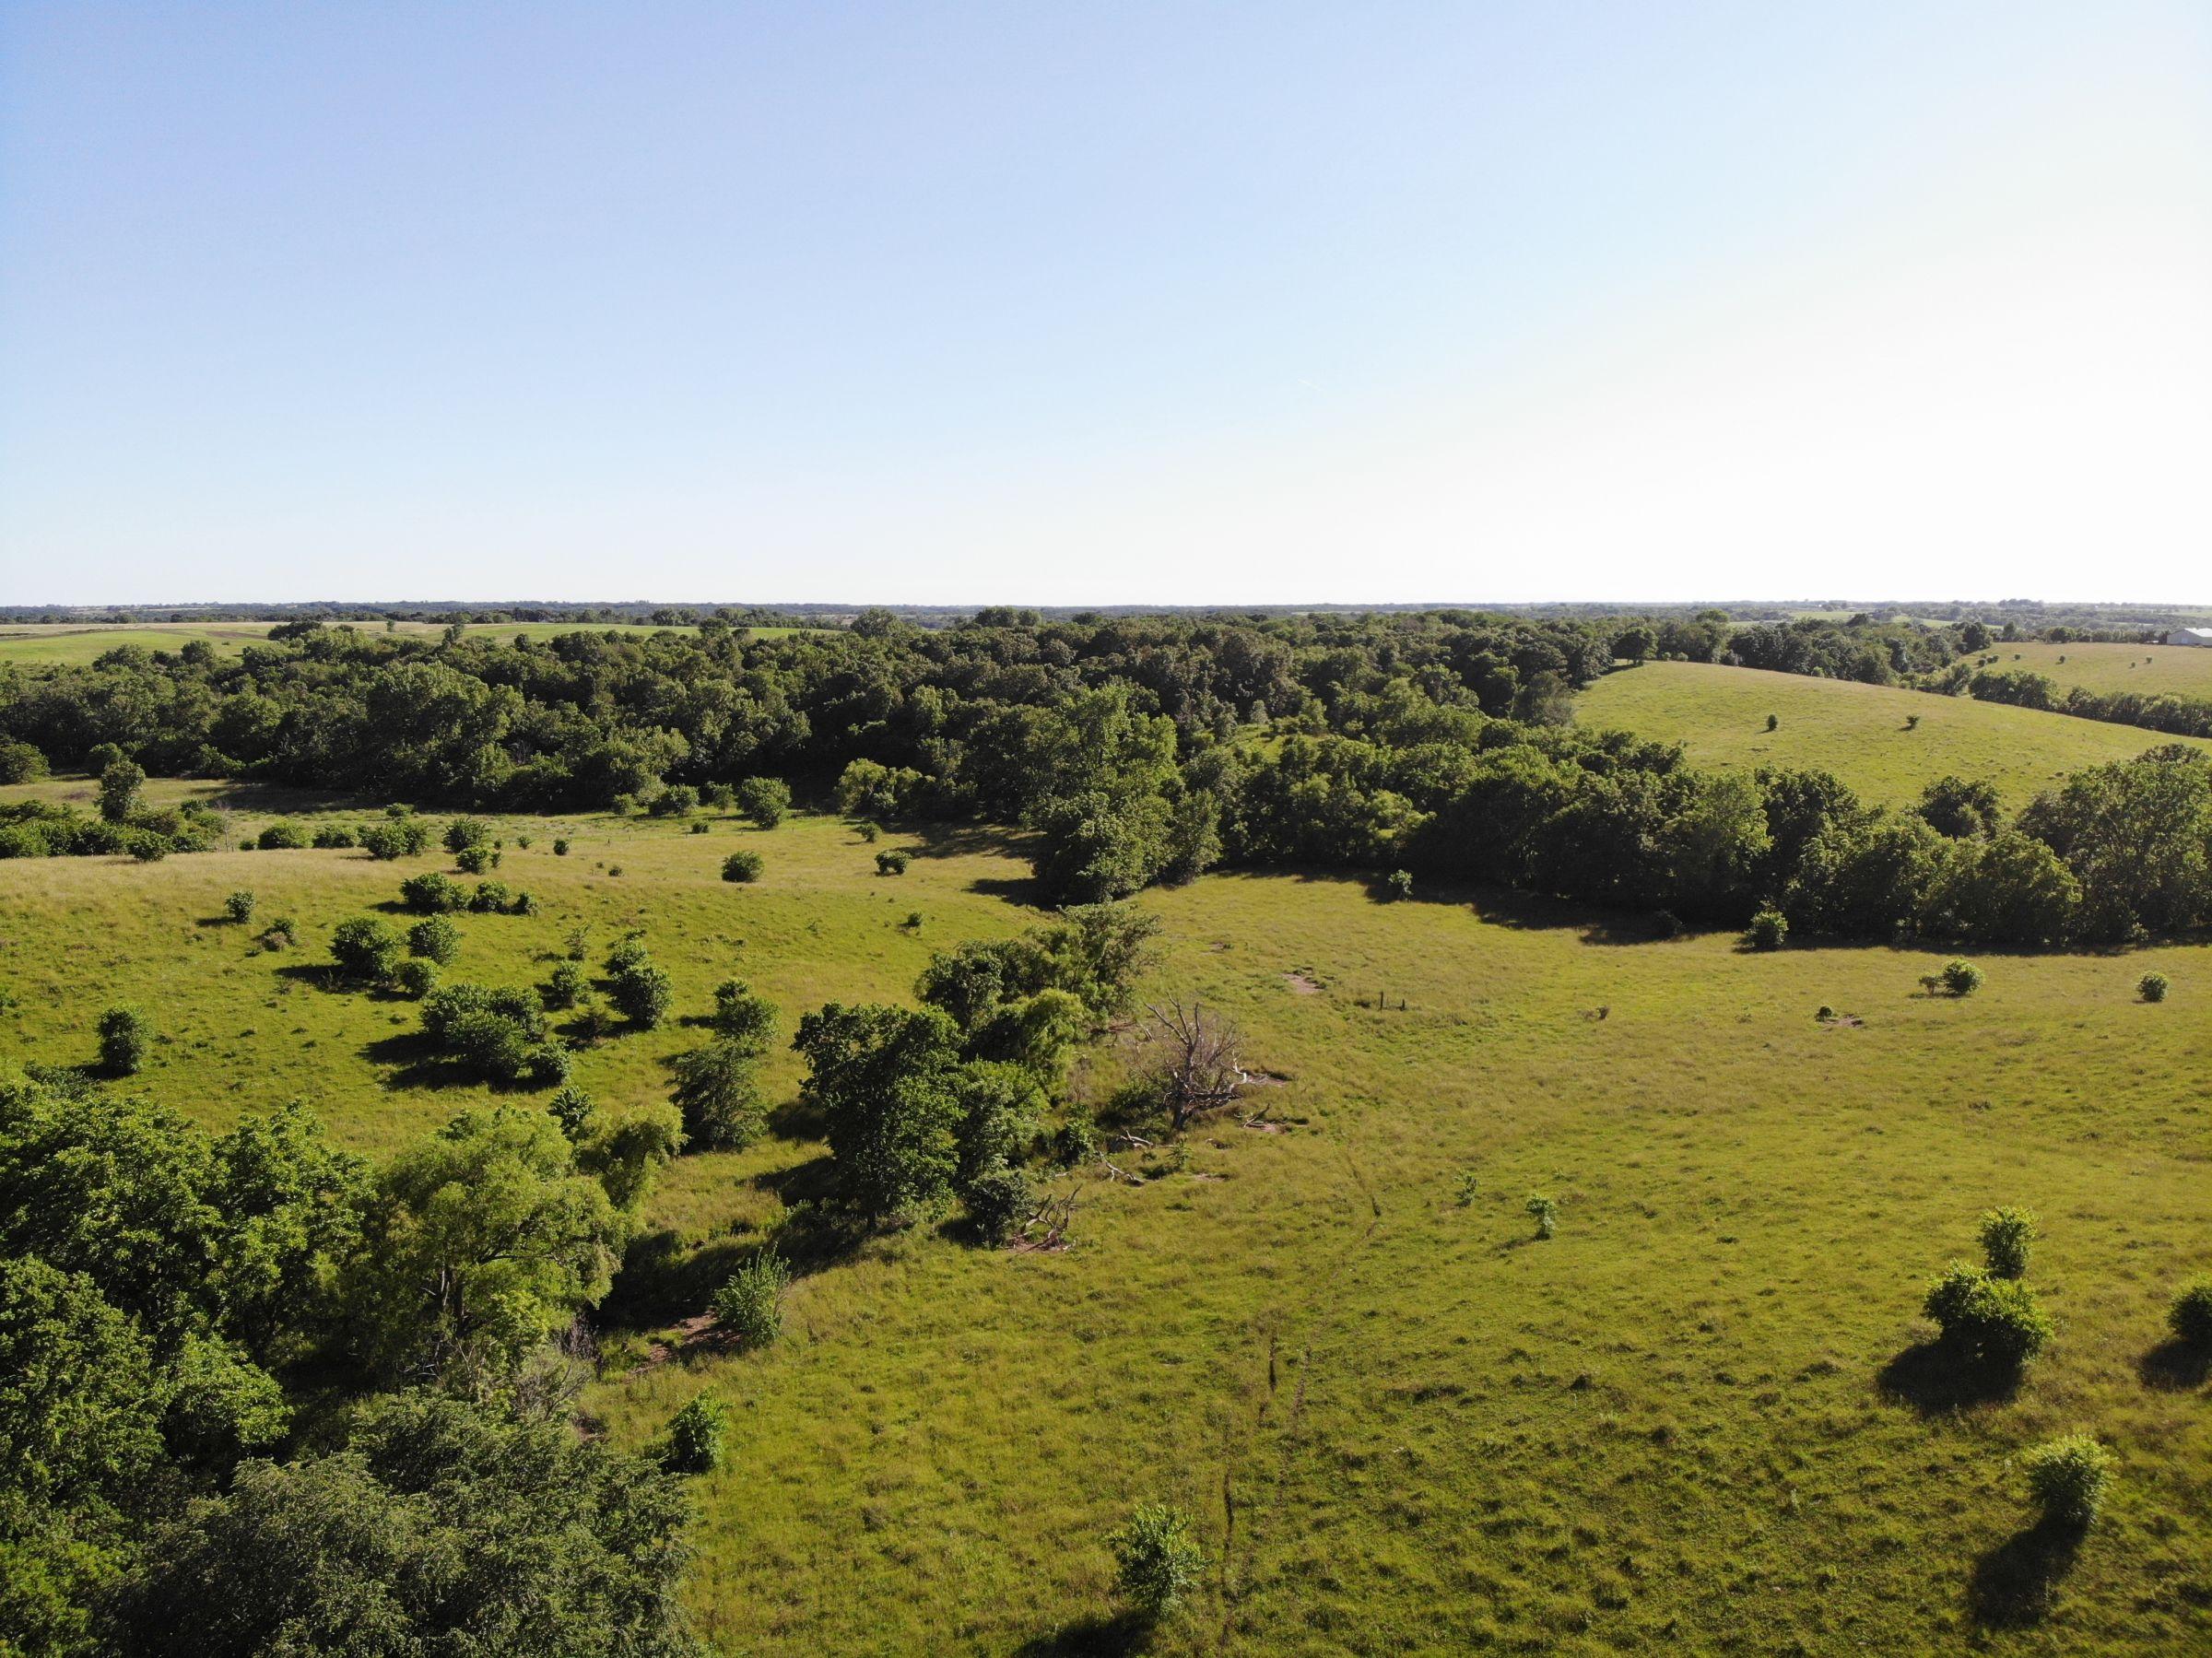 land-warren-county-iowa-60-acres-listing-number-15033-3-2020-06-15-160704.jpg